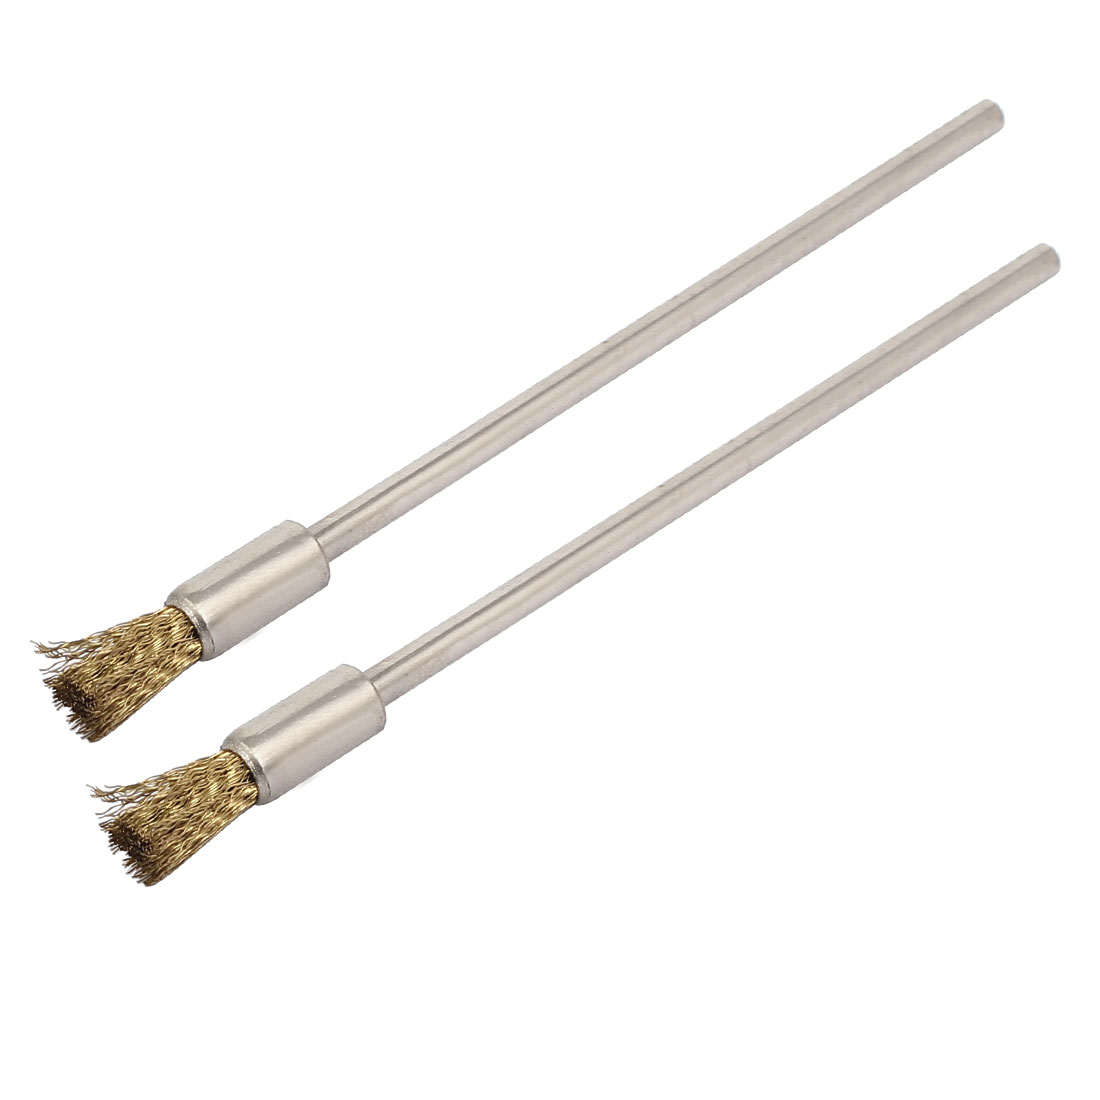 3mm Straight Shank 100mm Length Steel Wire Polishing Brush Gold Tone 2pcs